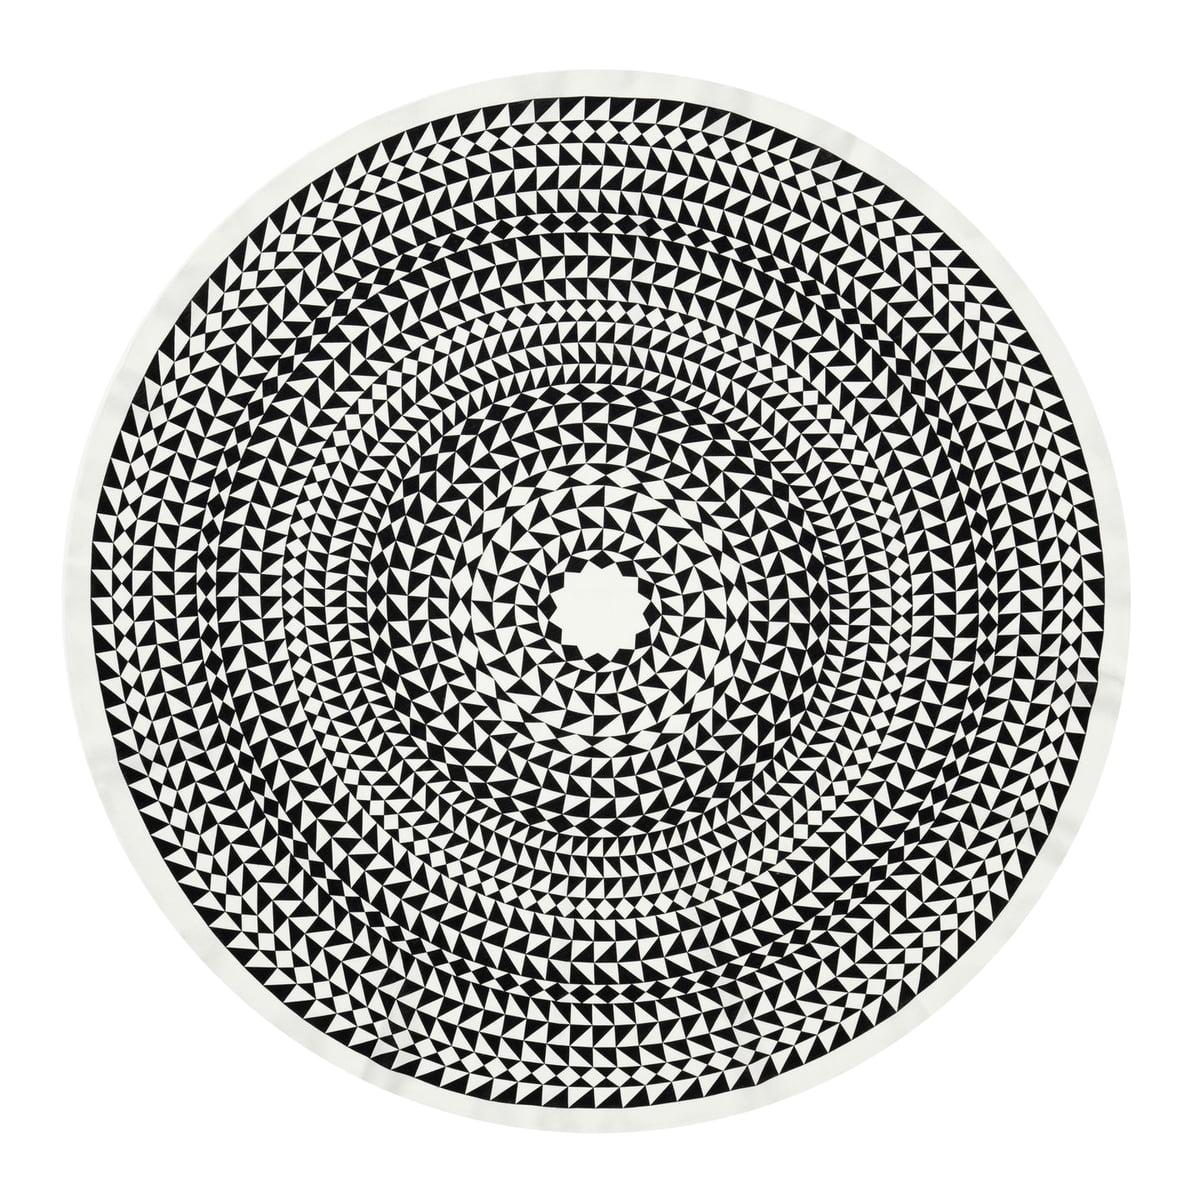 Designer Tischdecken designer tischdecken sukkulenten kaktus muster garten abdeckung